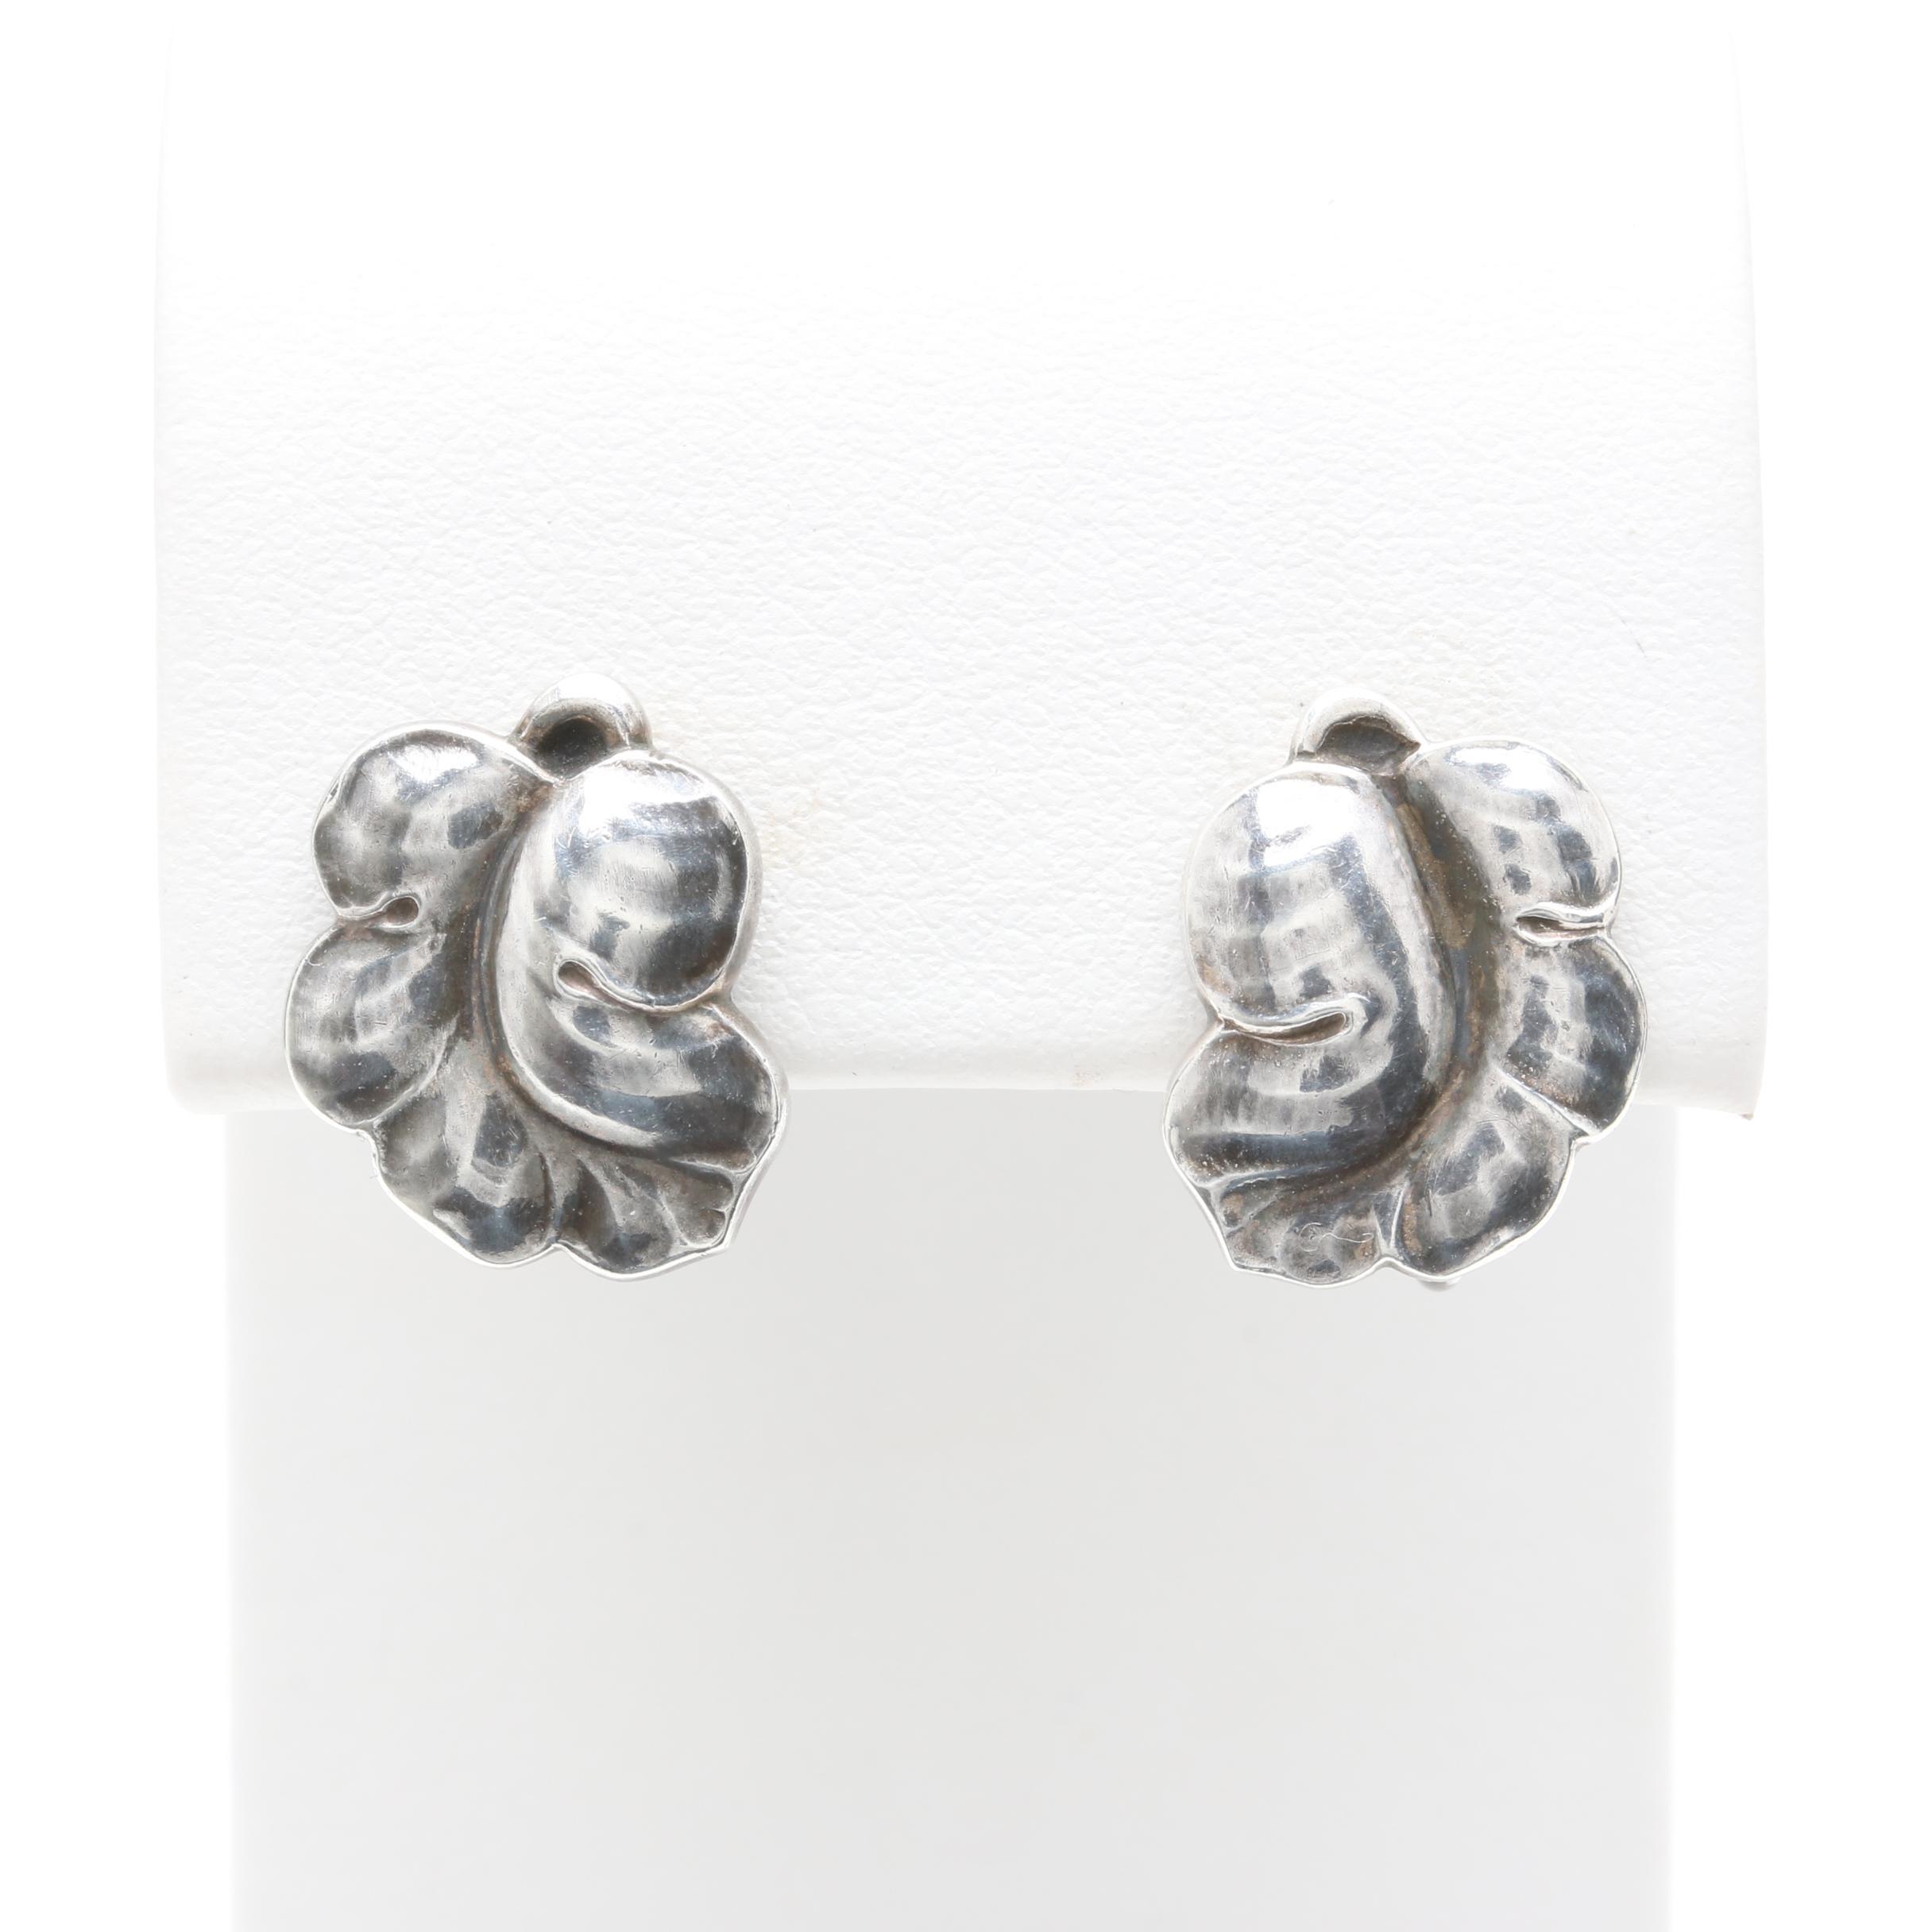 Circa 1915 - 1919 Georg Jensen Danish Sterling Silver Screw Back Earrings